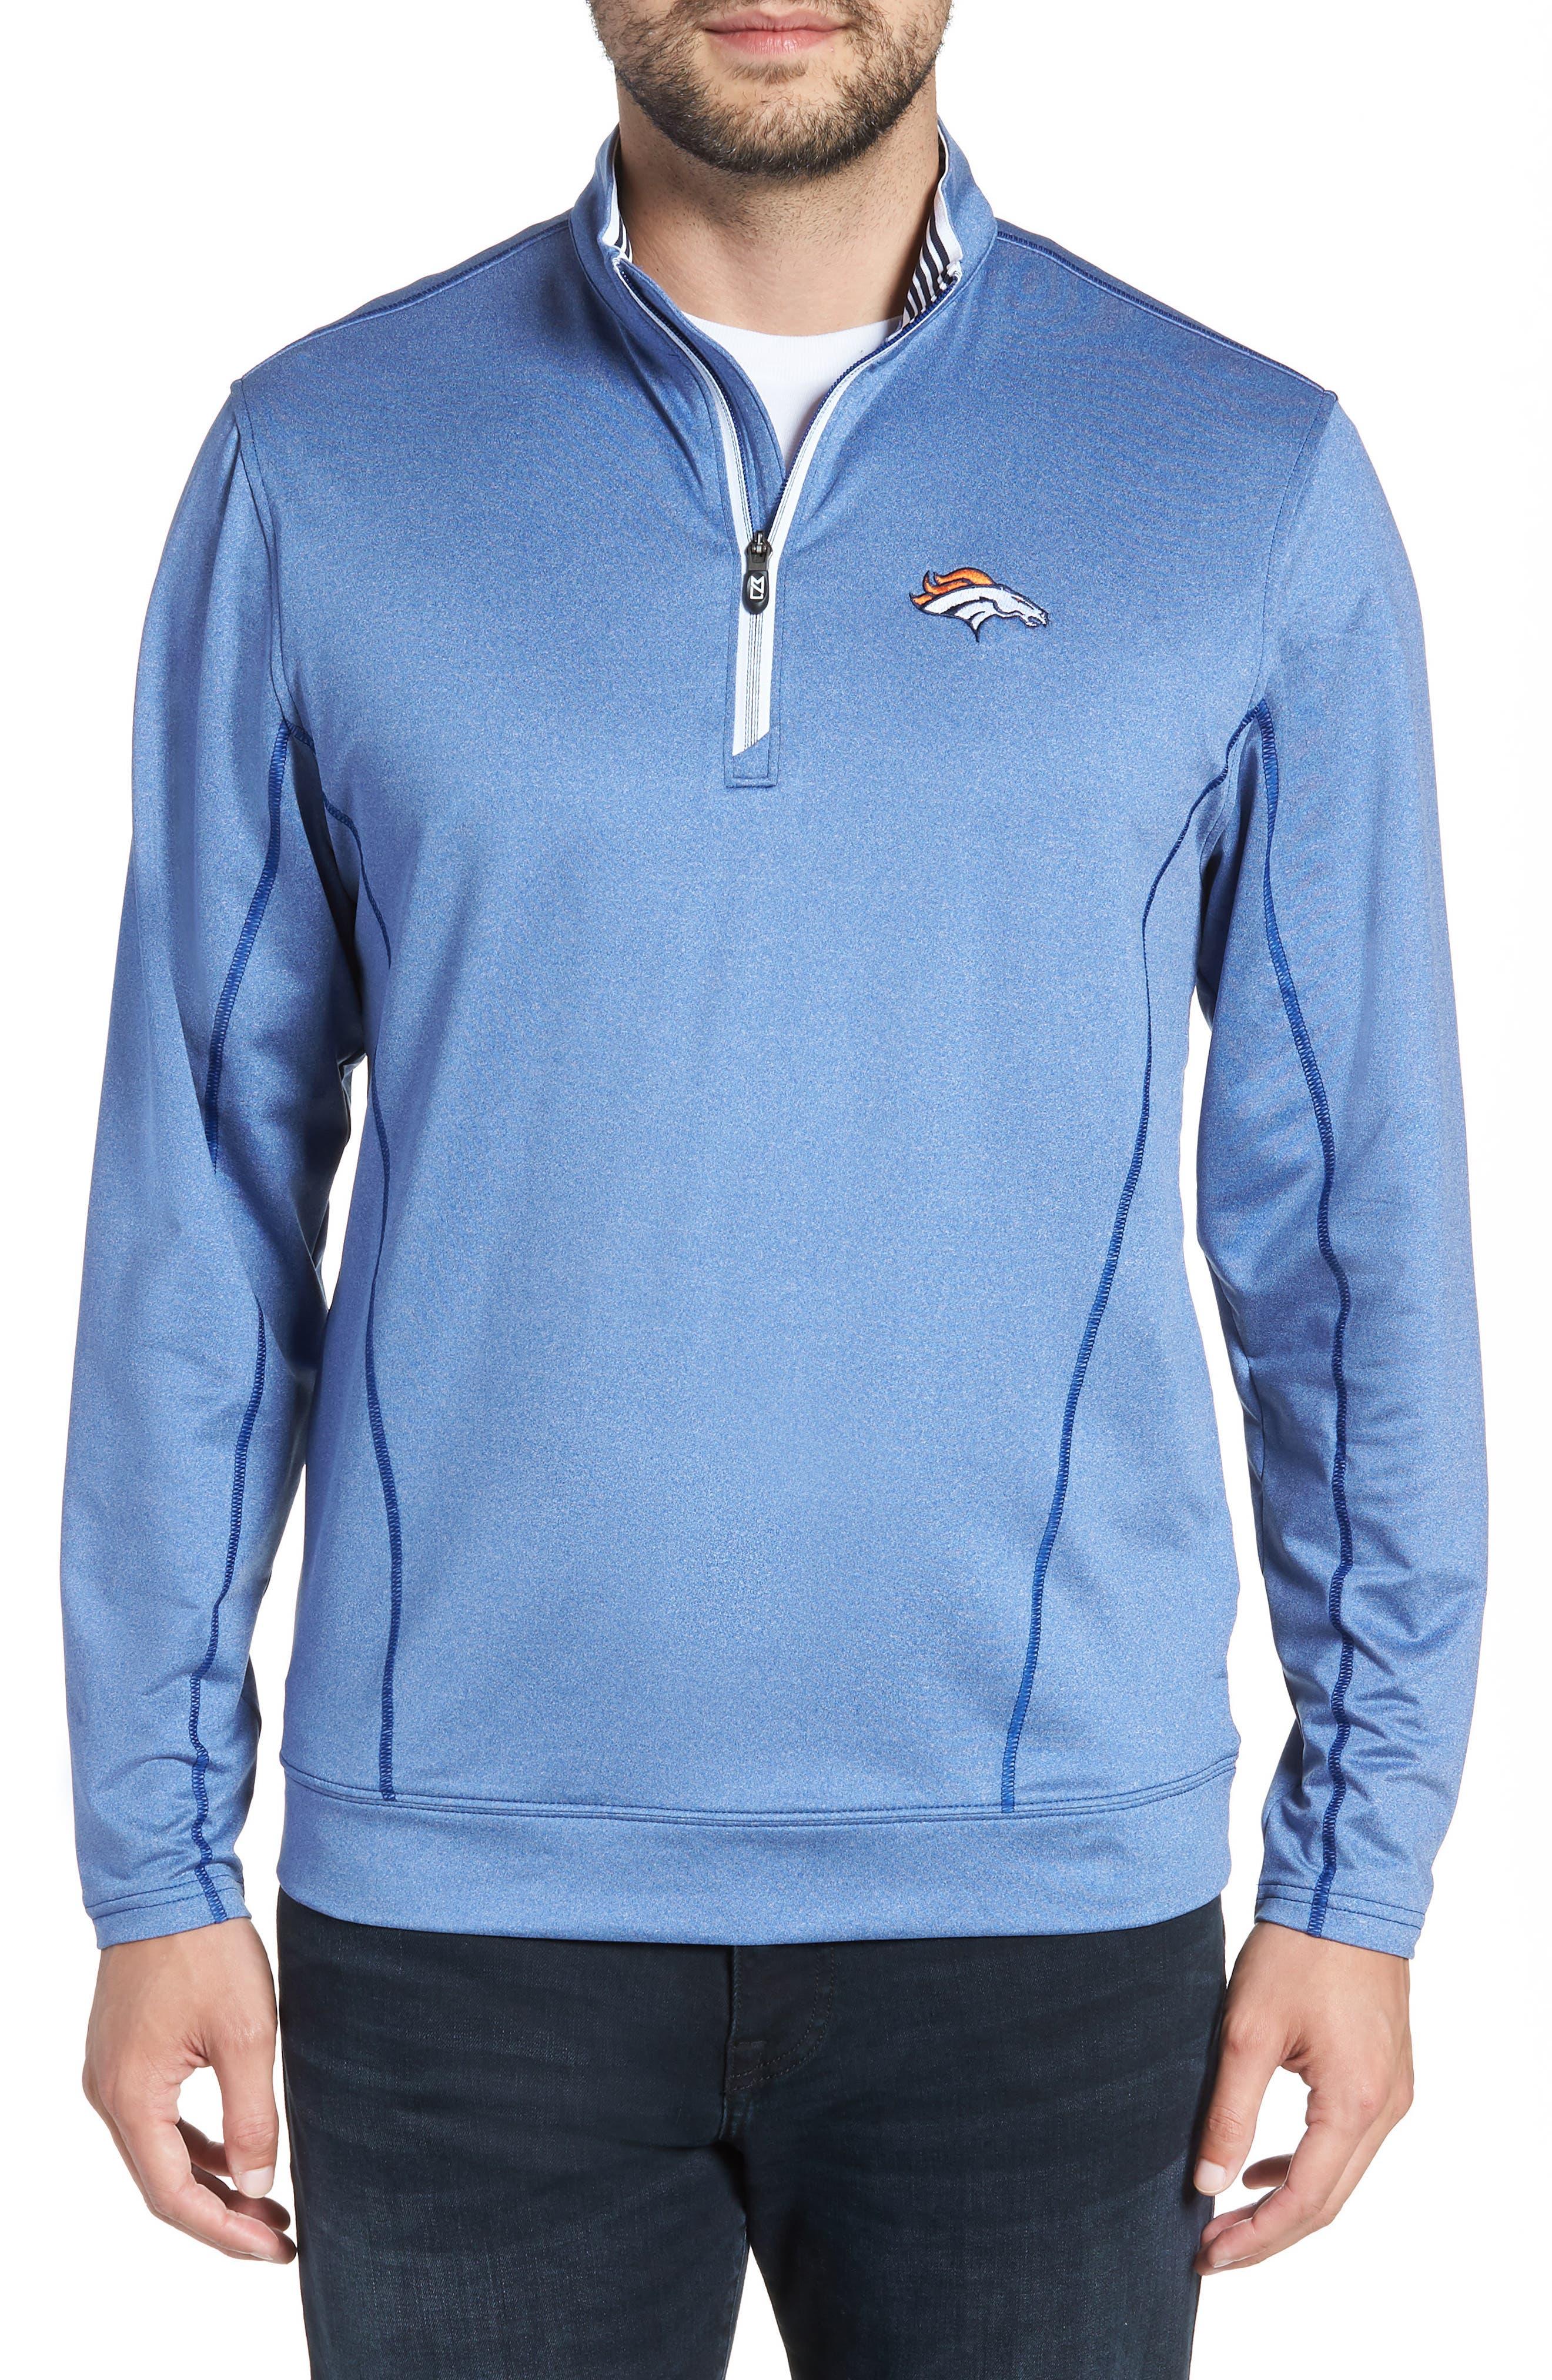 Endurance Denver Broncos Regular Fit Pullover,                             Main thumbnail 1, color,                             425